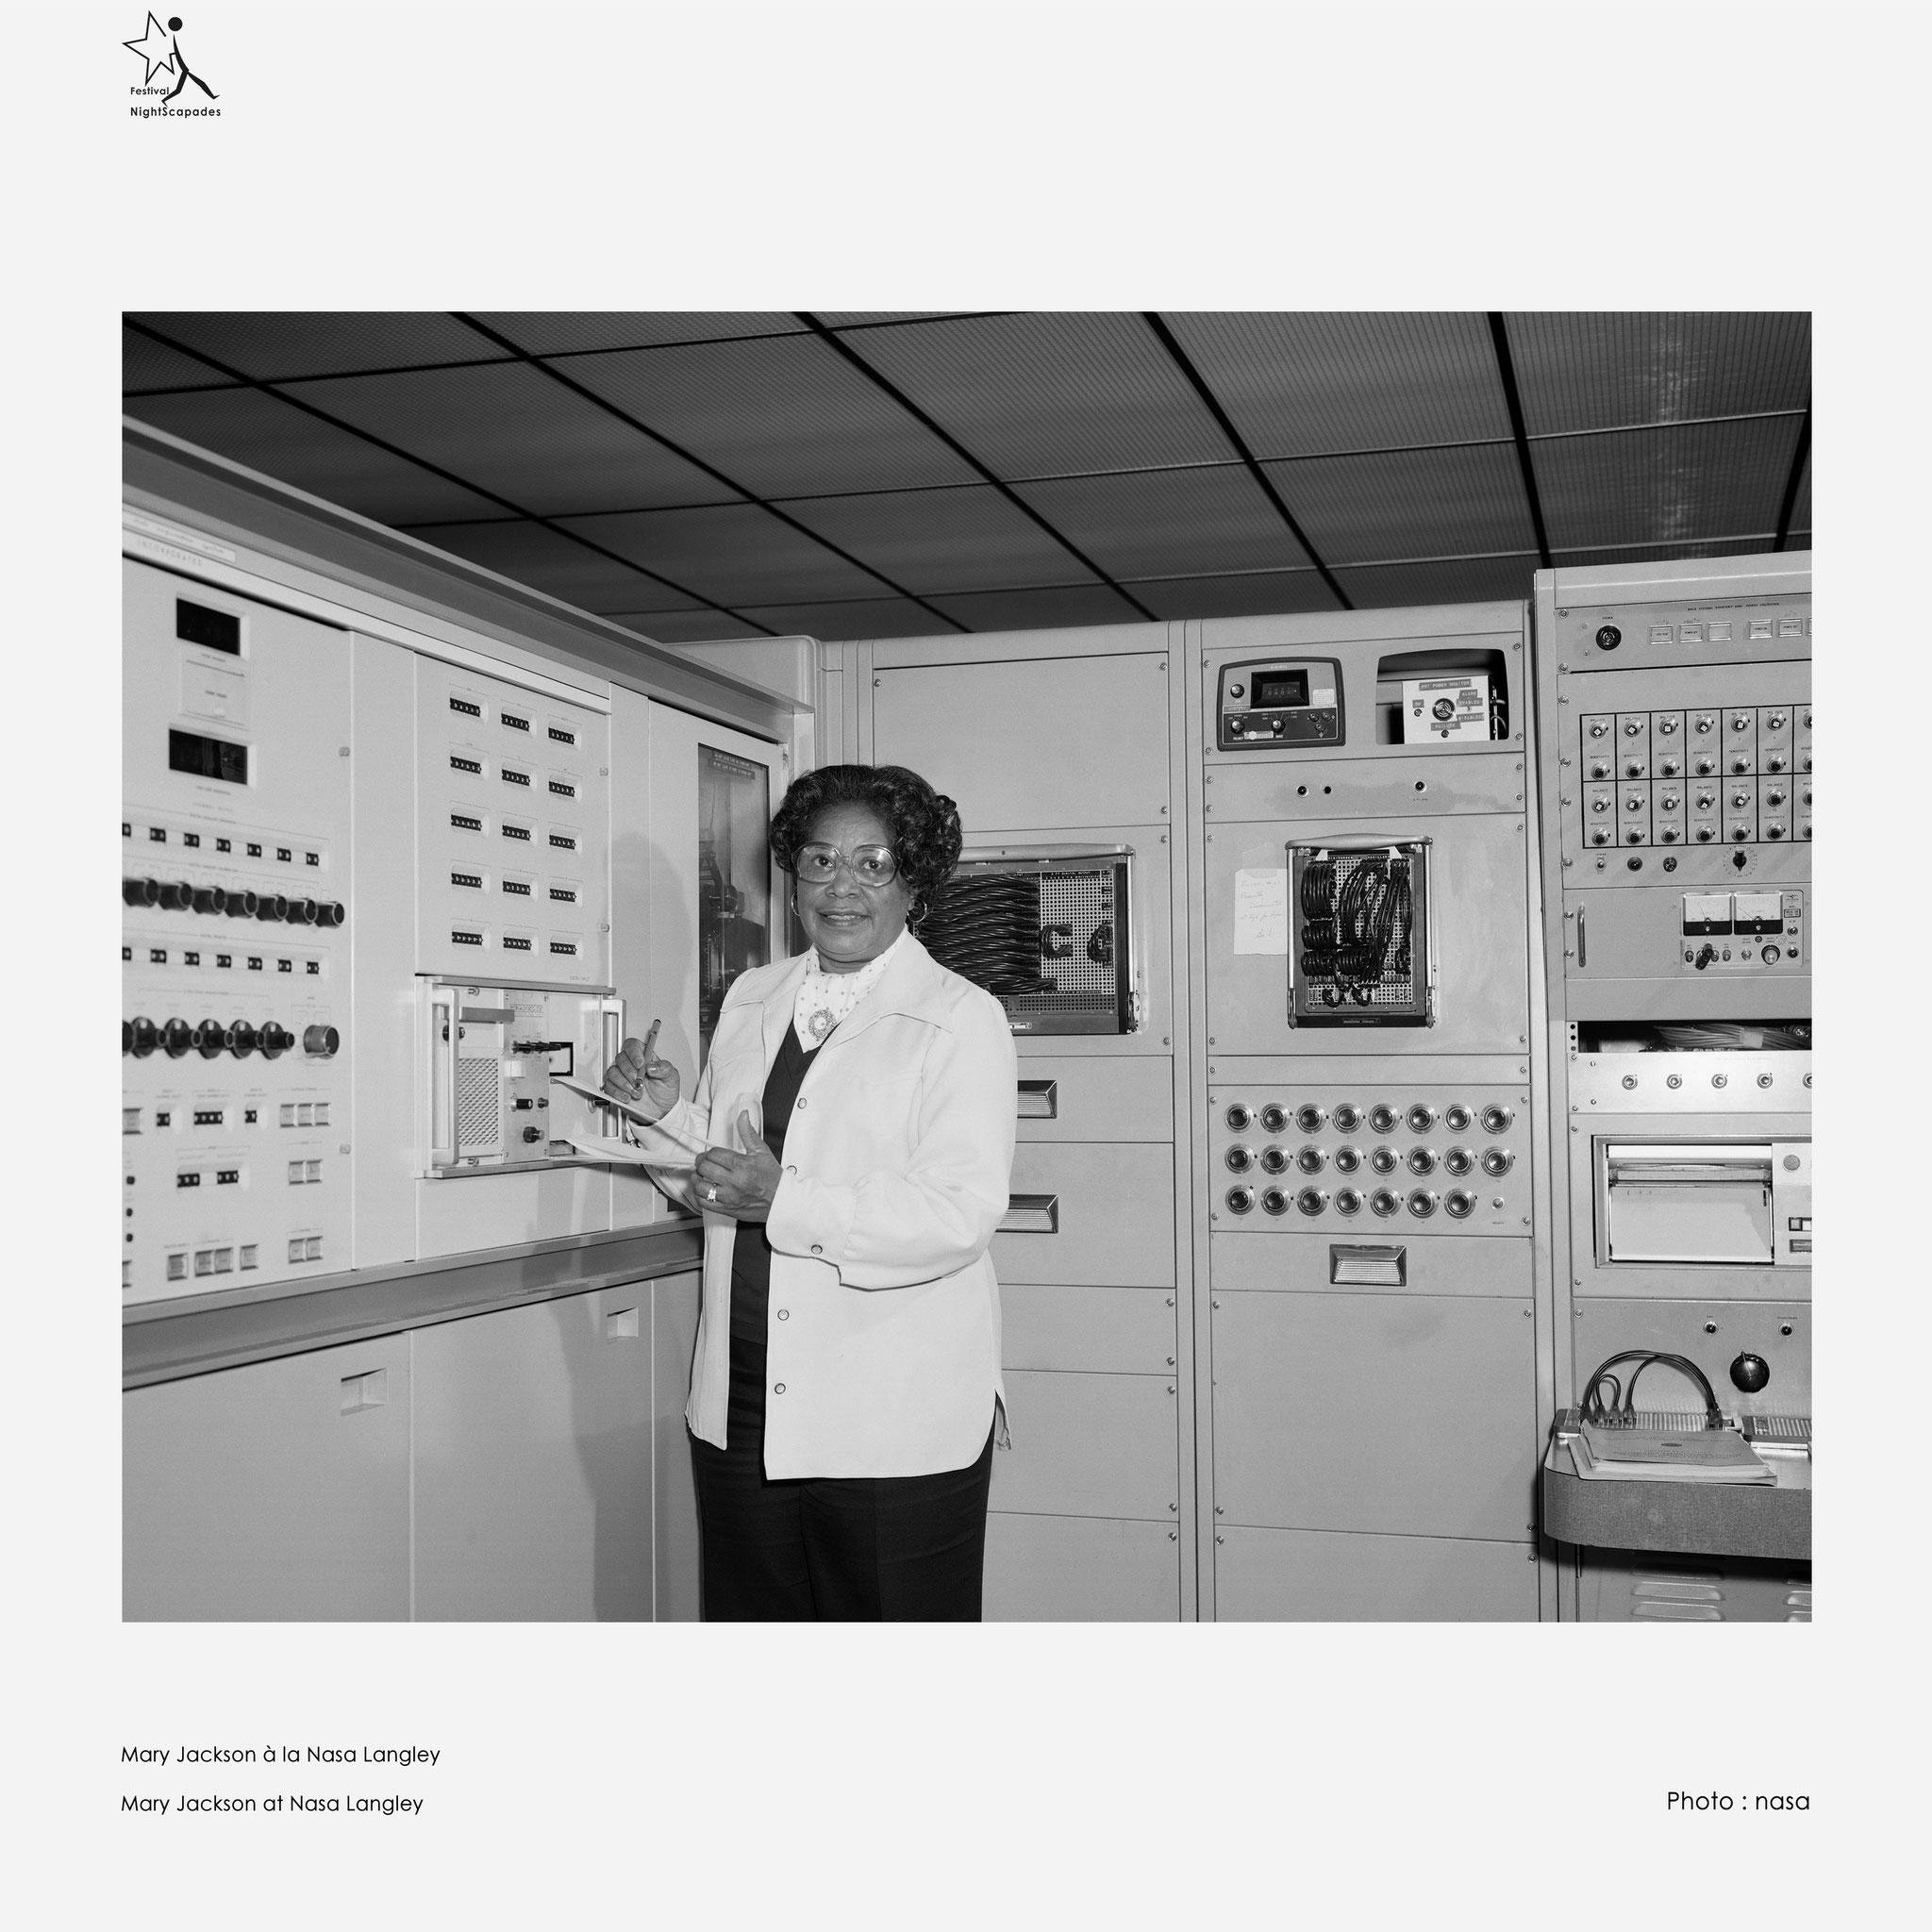 Mary Jackson à la NASA Langley n°2